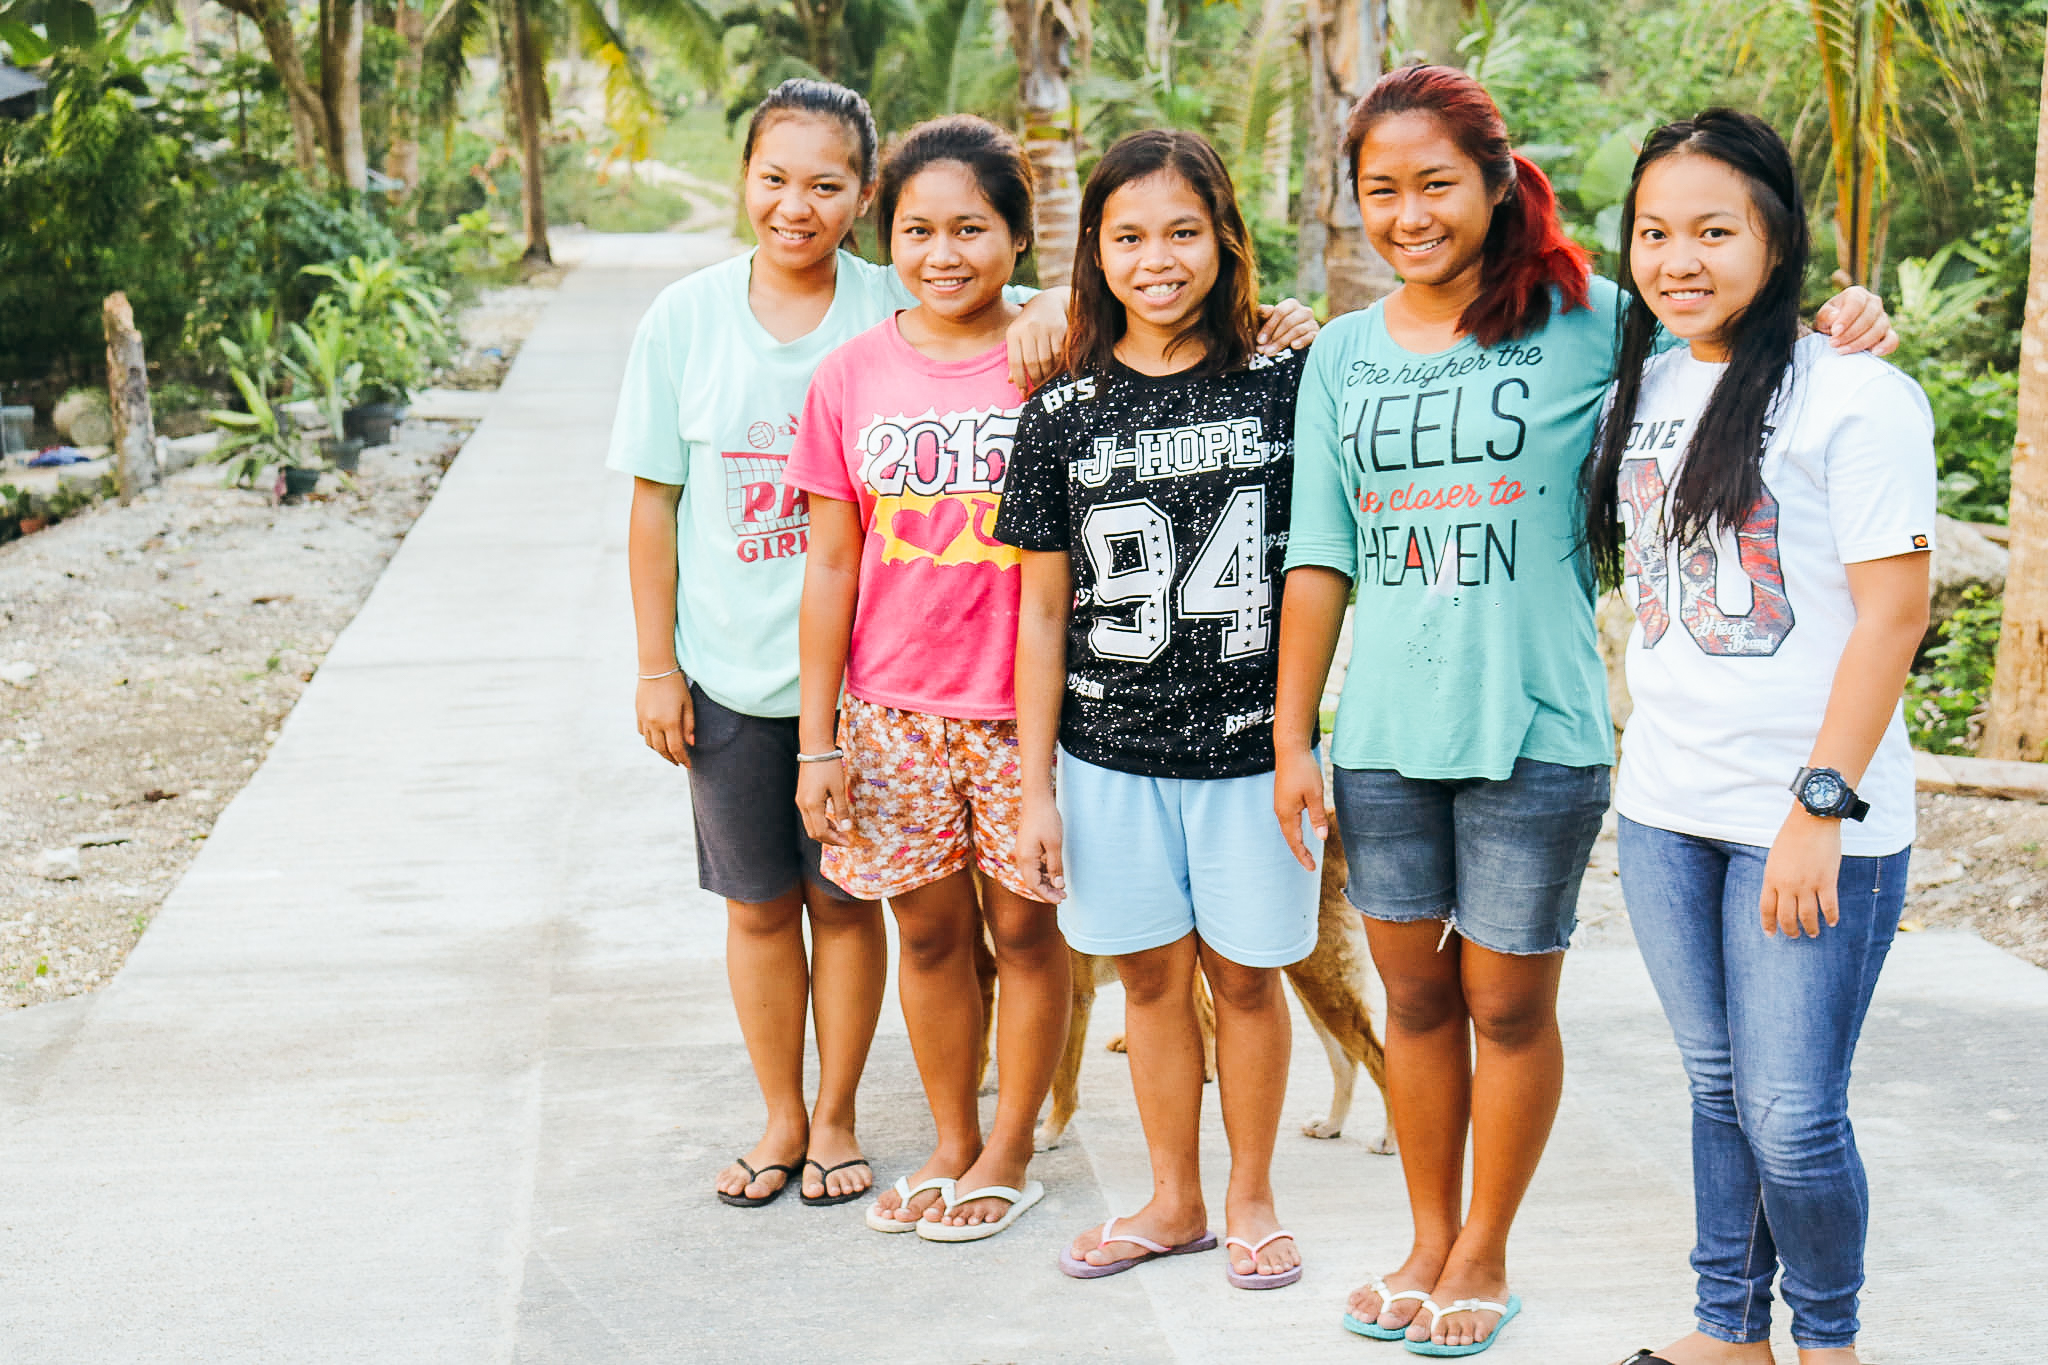 Cebu lead photo